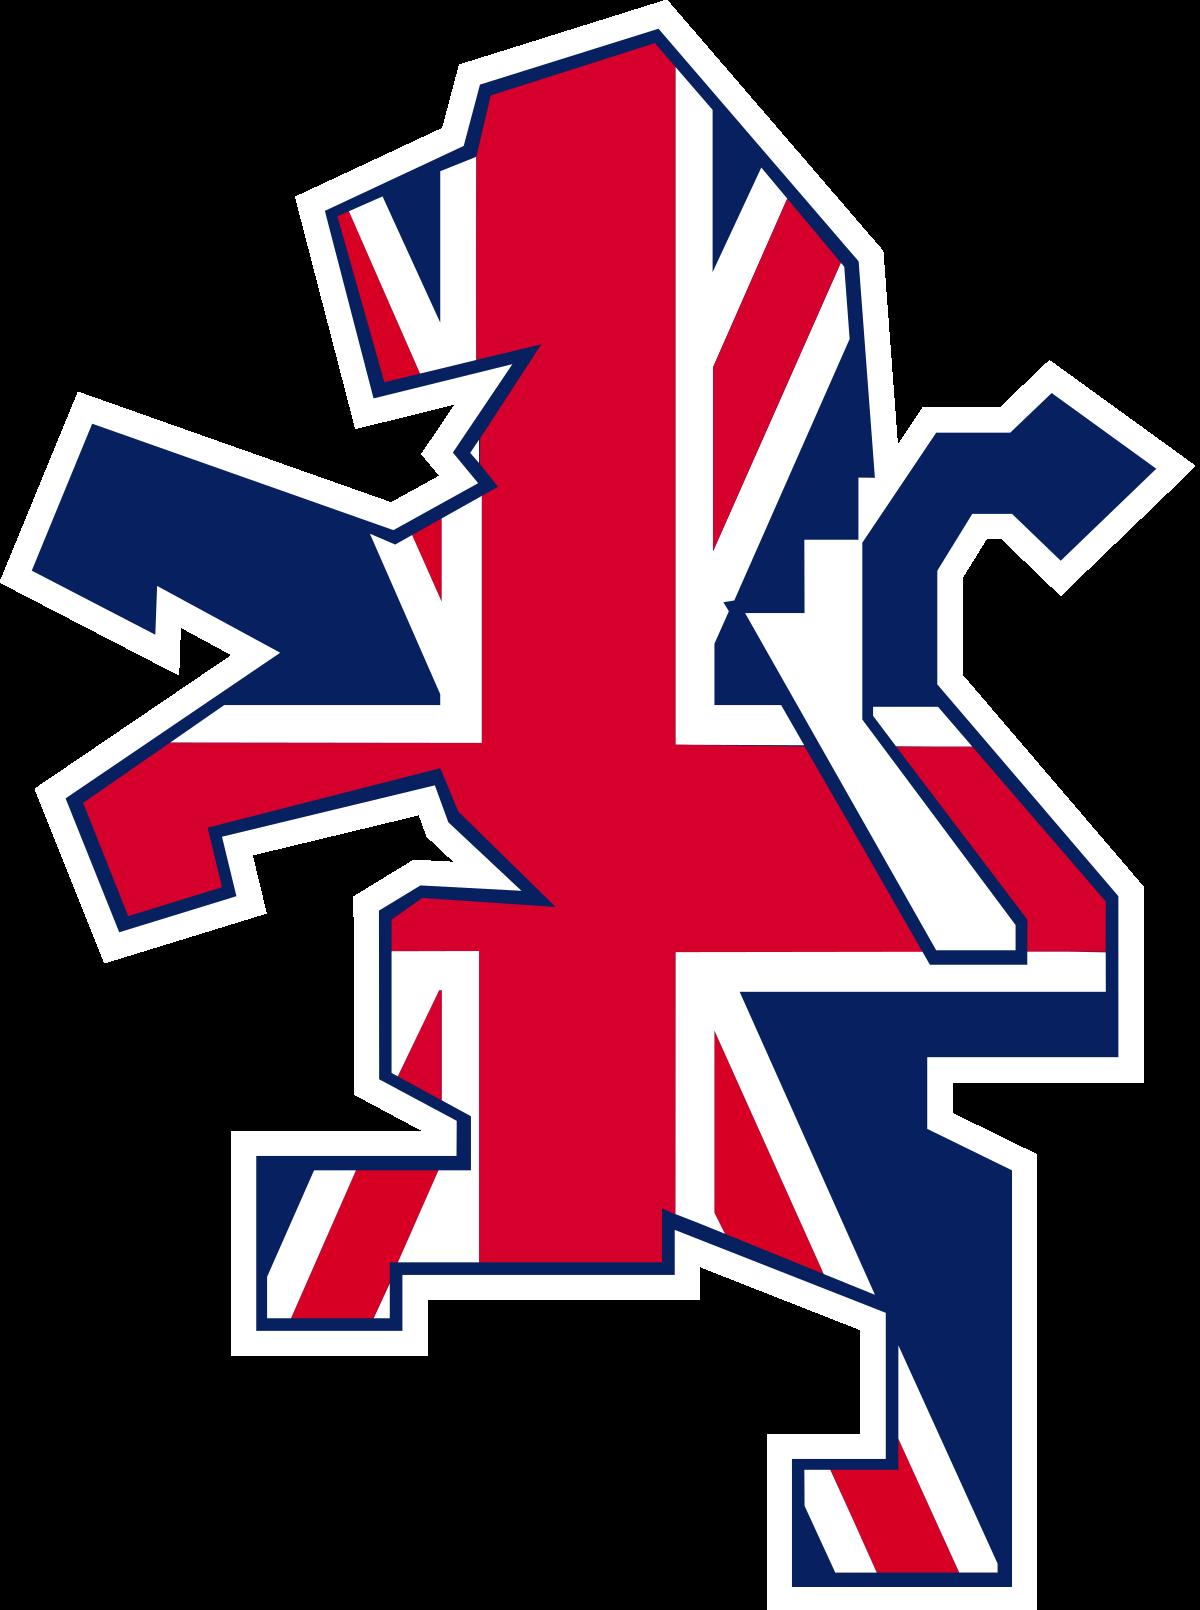 Lion & bat shield kingdom baseball clipart transparent download Great Britain men's national ice hockey team - Wikipedia transparent download